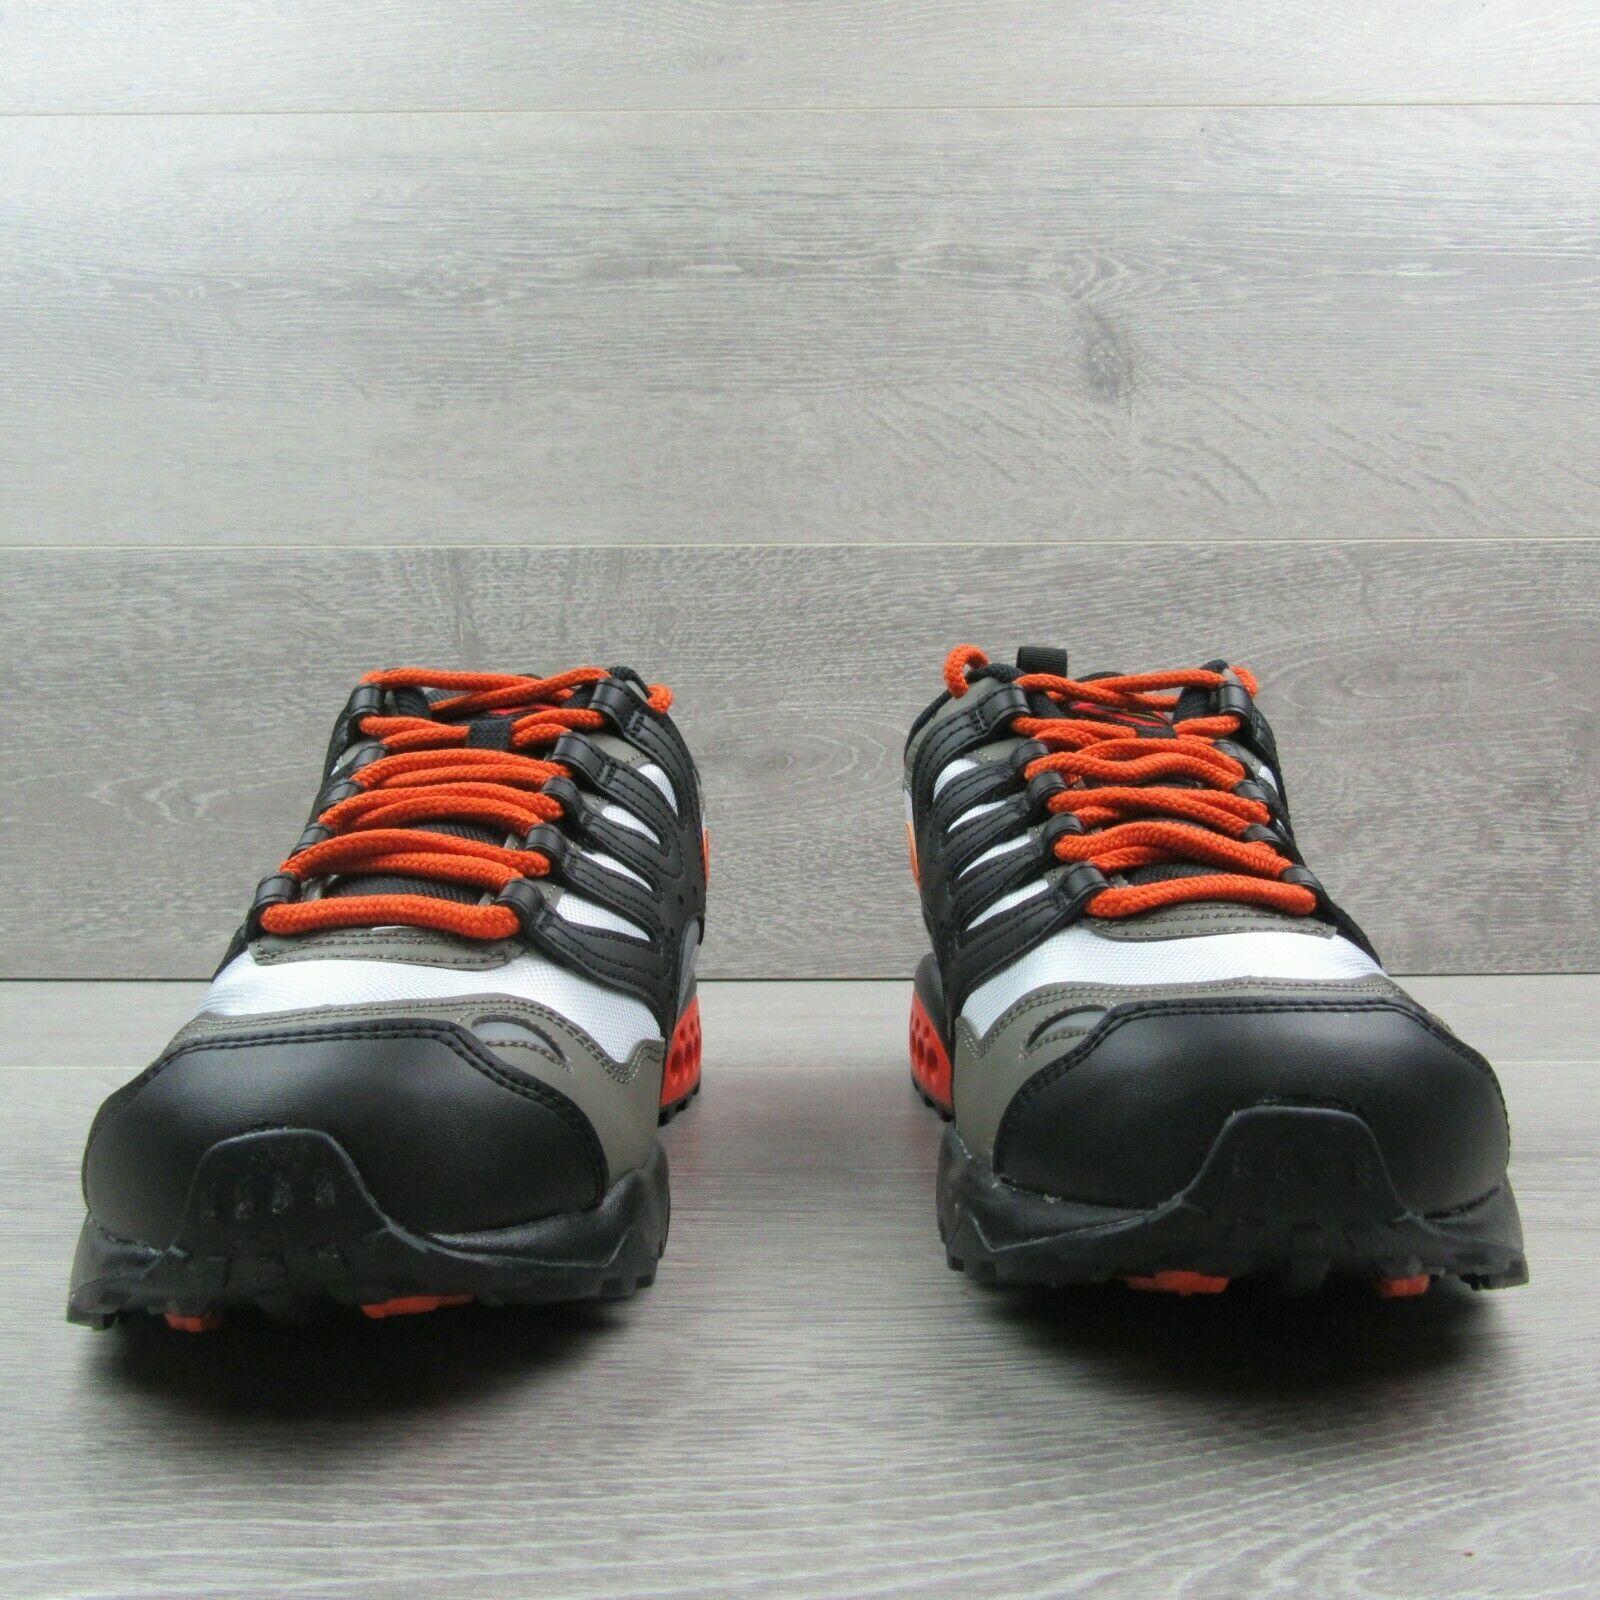 Nike Air Terra Humara Mens Lifestyle Trail Shoes Grey Orange Black AO1545 003